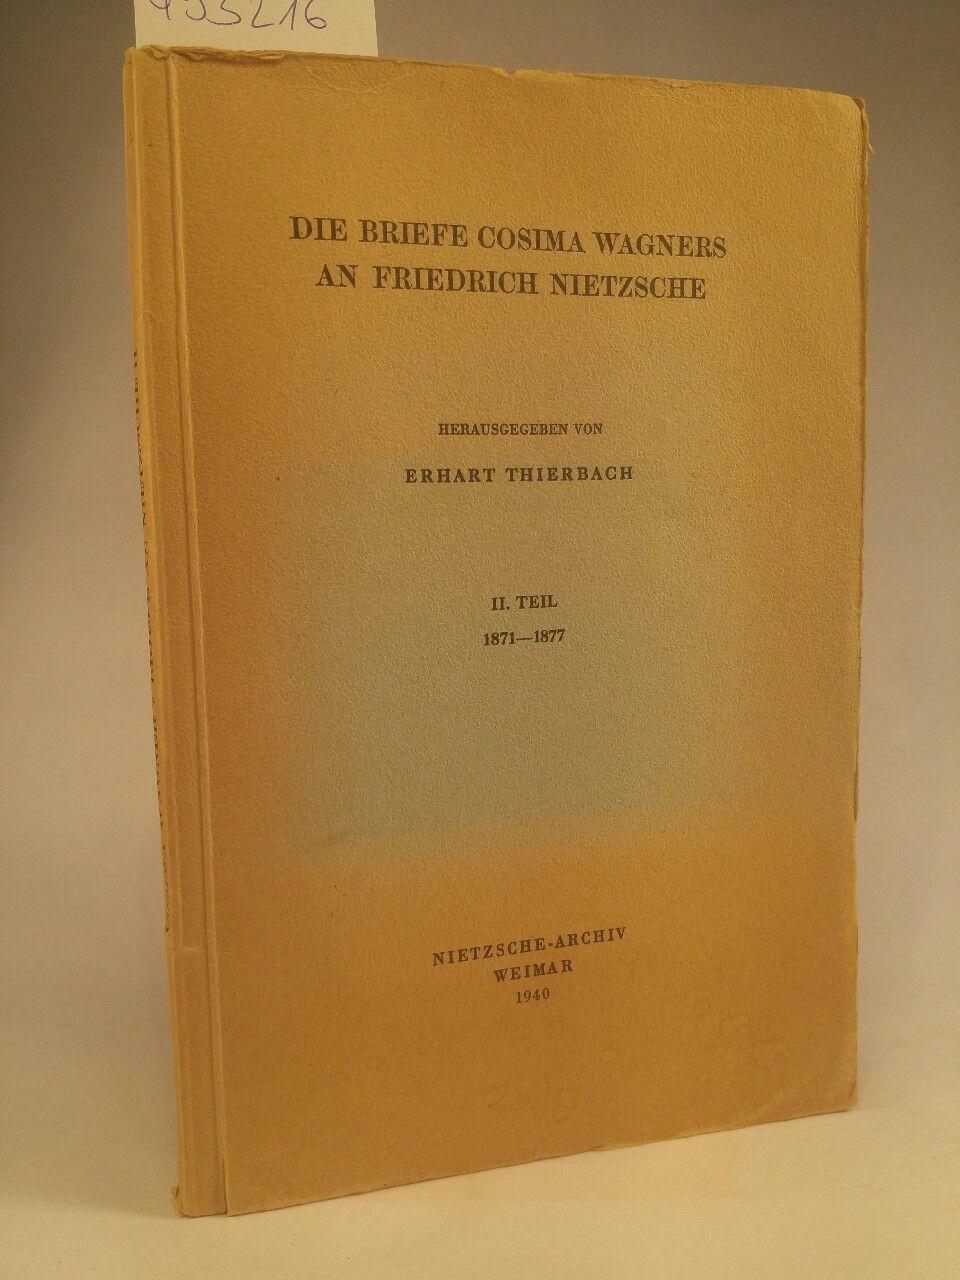 Die Briefe Cosima Wagners an Friedrich Nietzsche II. Teil, 1871-1877 - Thierbach (Hrsg.), Erhart